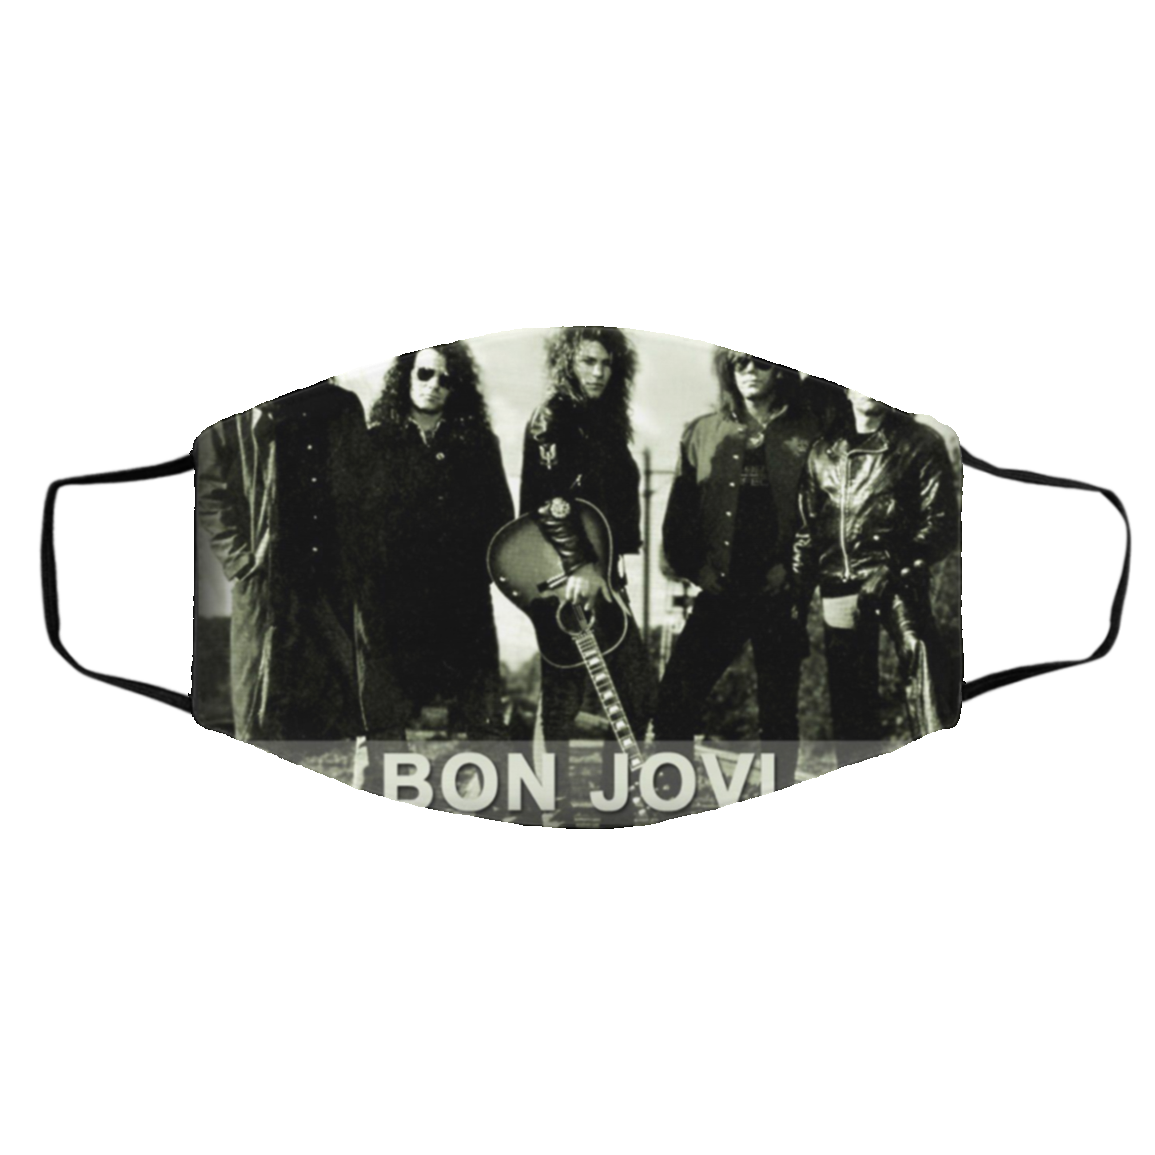 -Bla-ck Bo-n Jo-vi Face Mask Cloth Face Masks